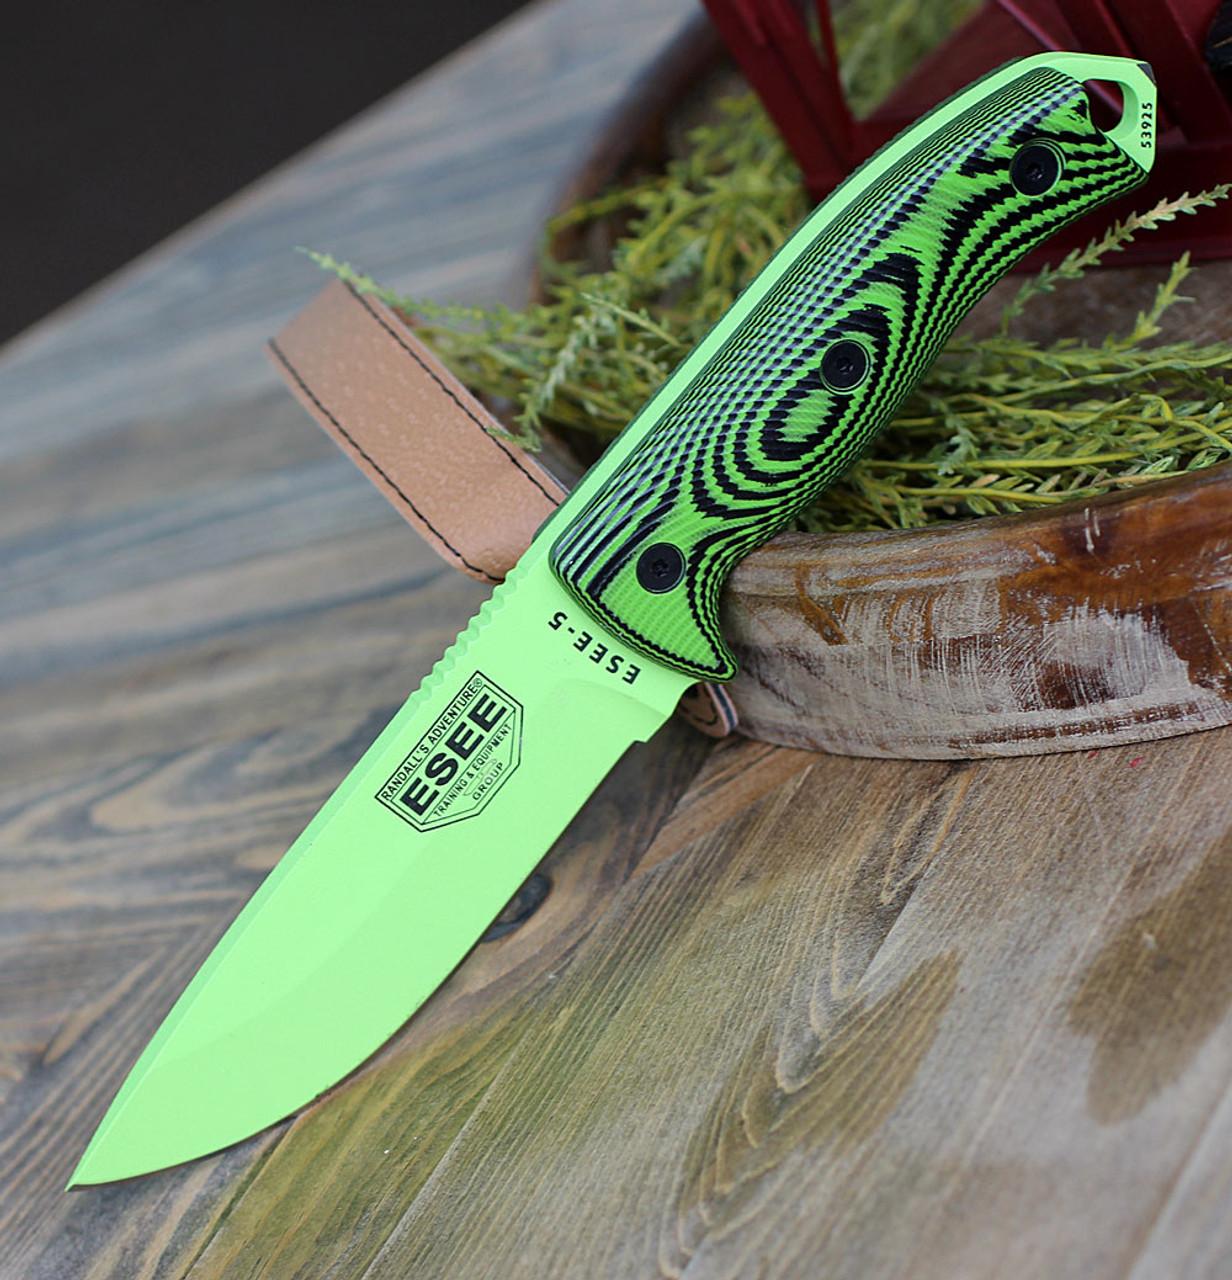 ESEE-5 Venom Green Blade Neon Green//Black G10 3D Handle Black Kydex Sheath